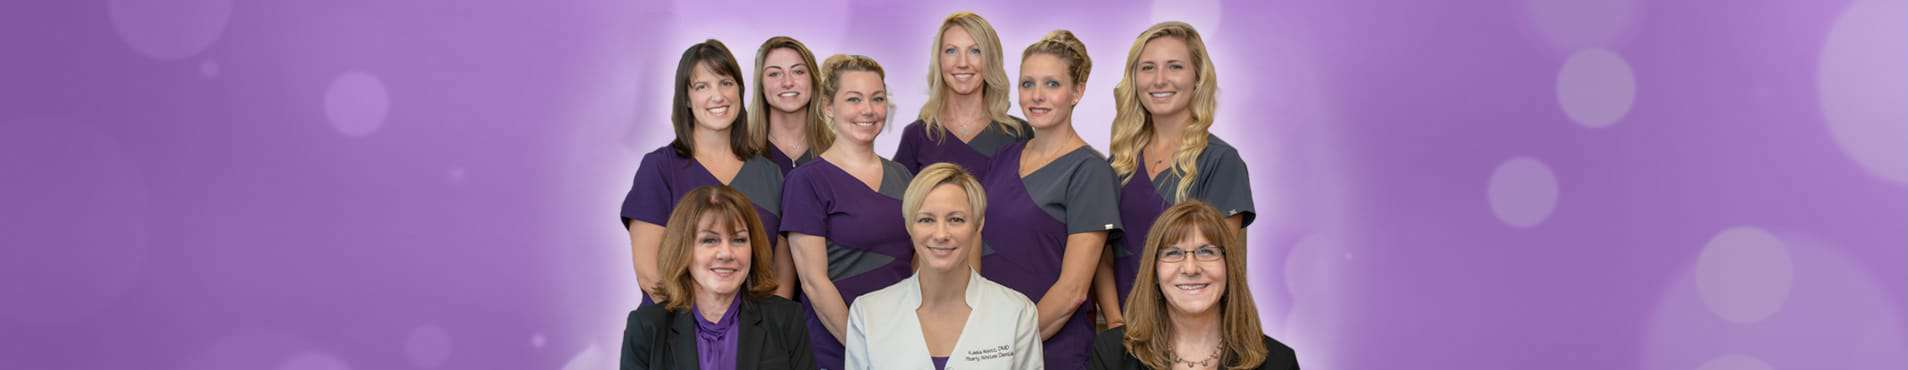 Dental Crowns Dentist Serving Upper Makefield